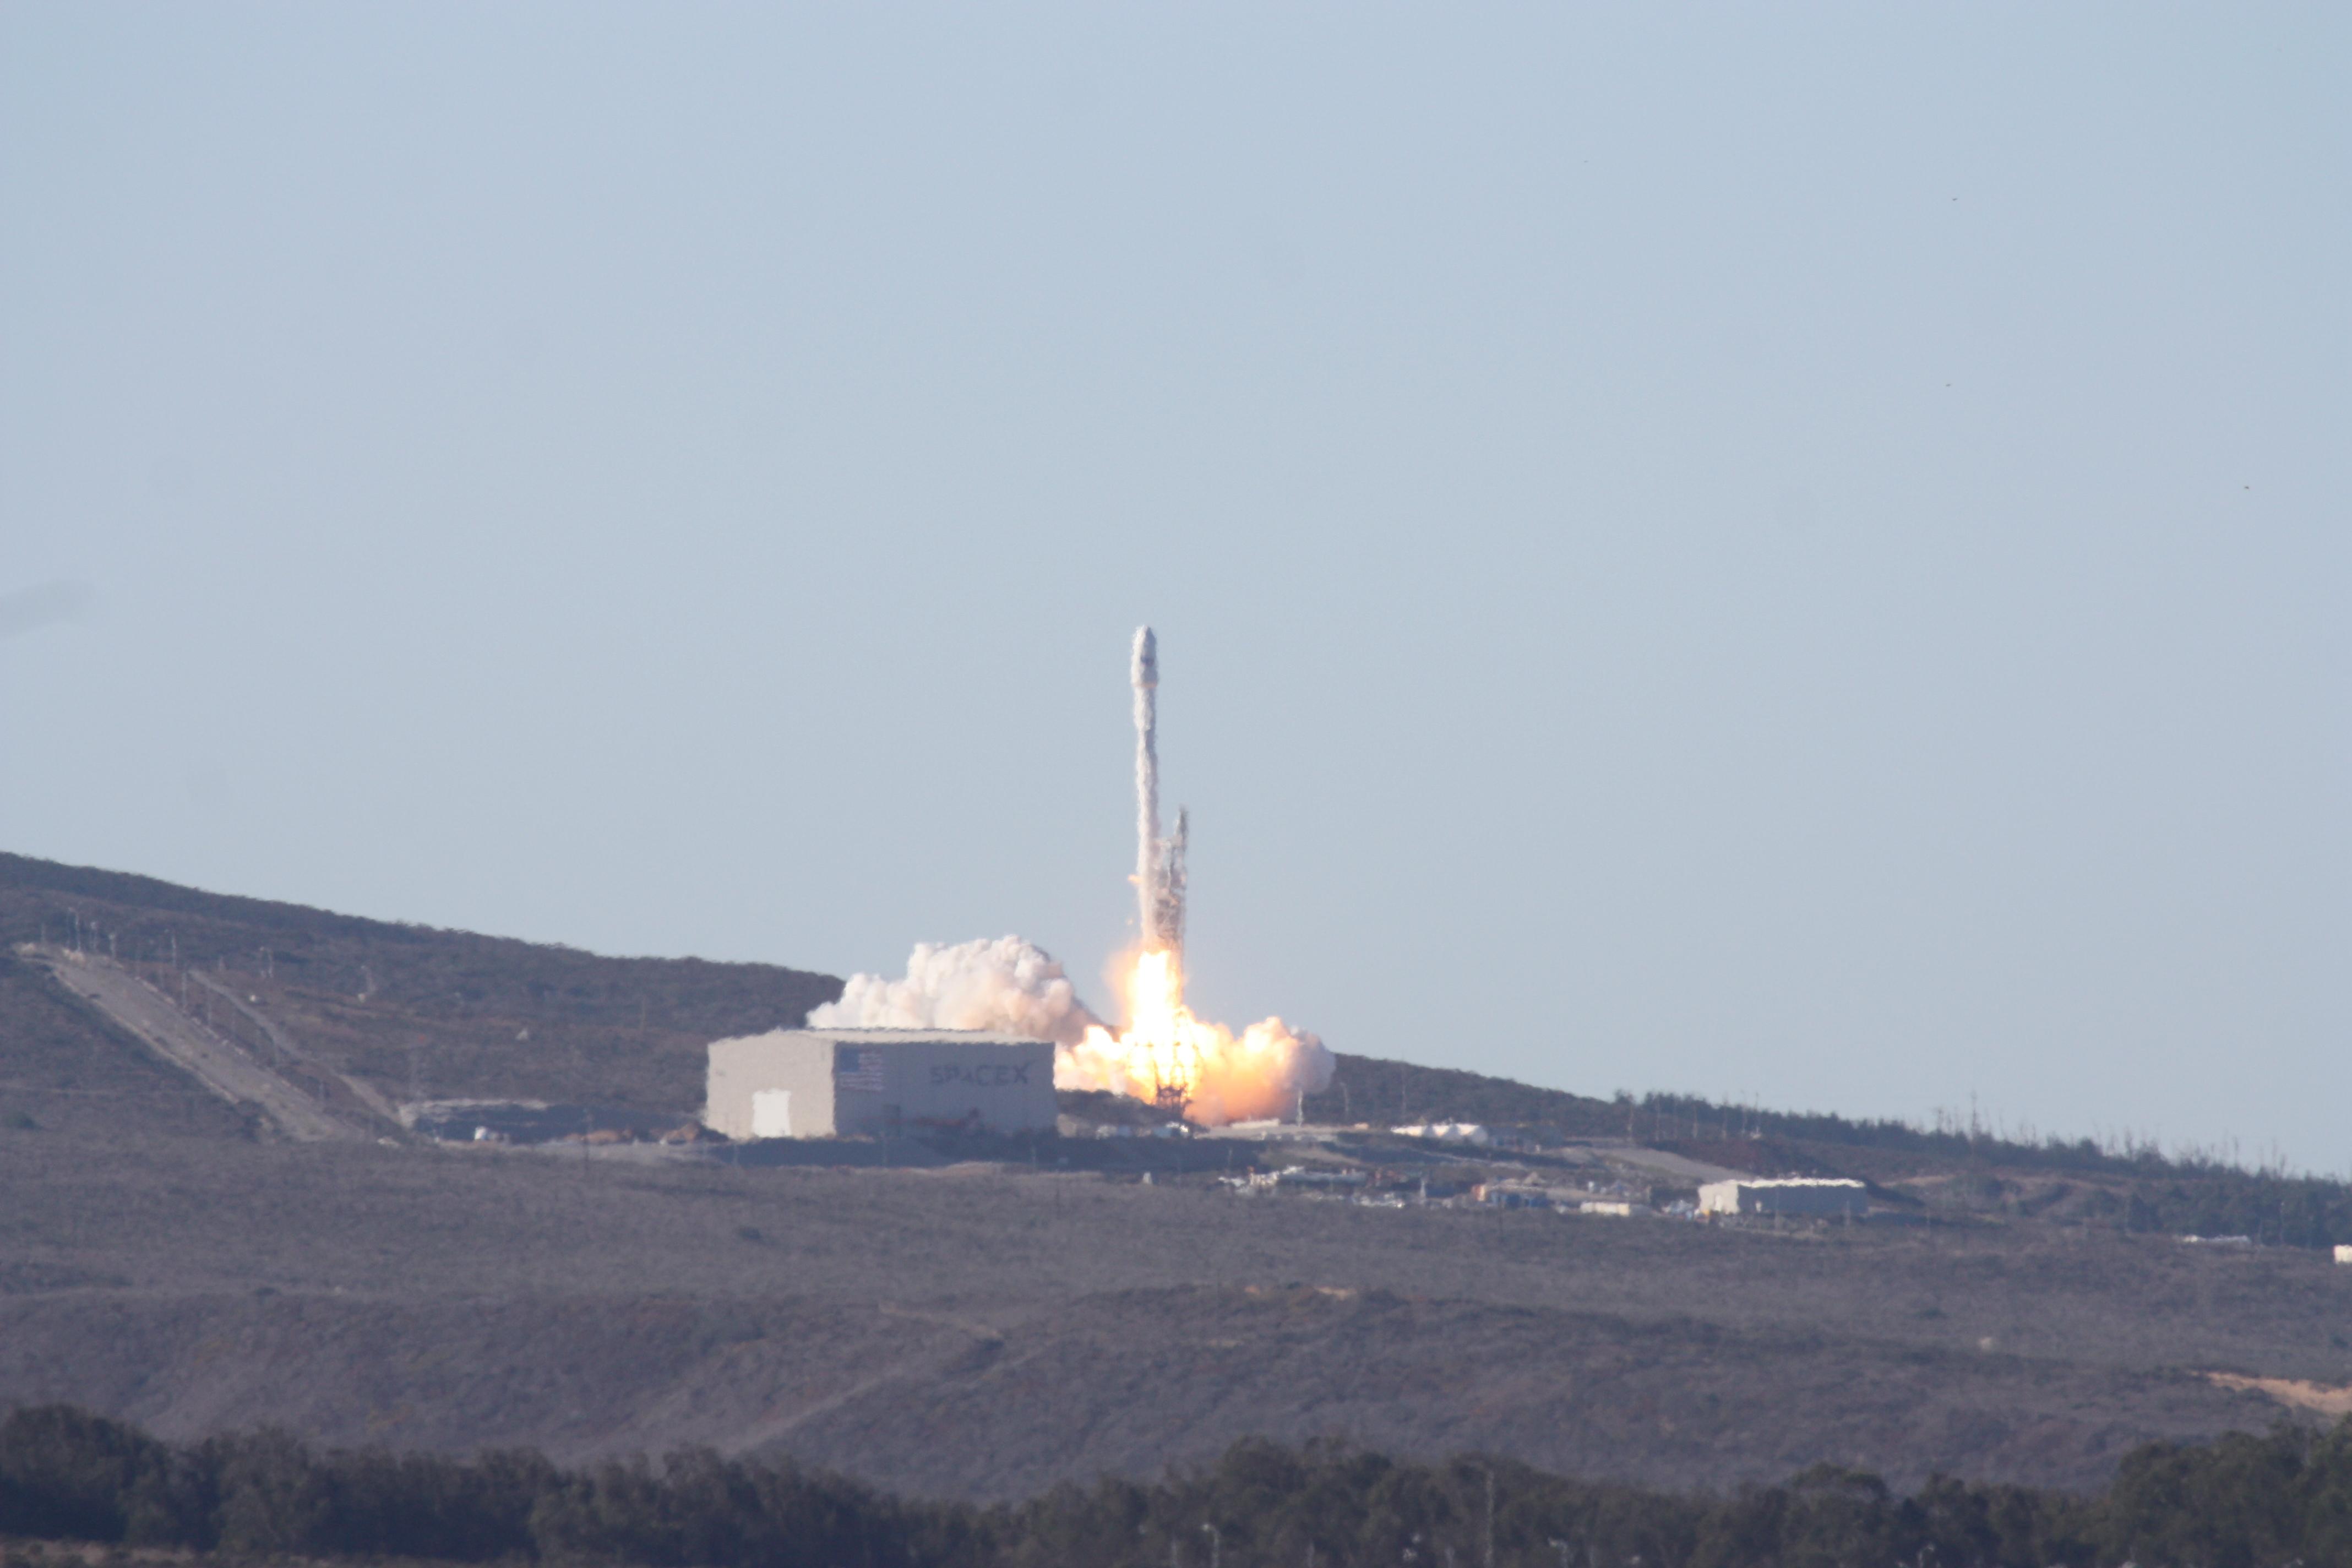 spacex falcon v1.1 vandenberg arrives - photo #39